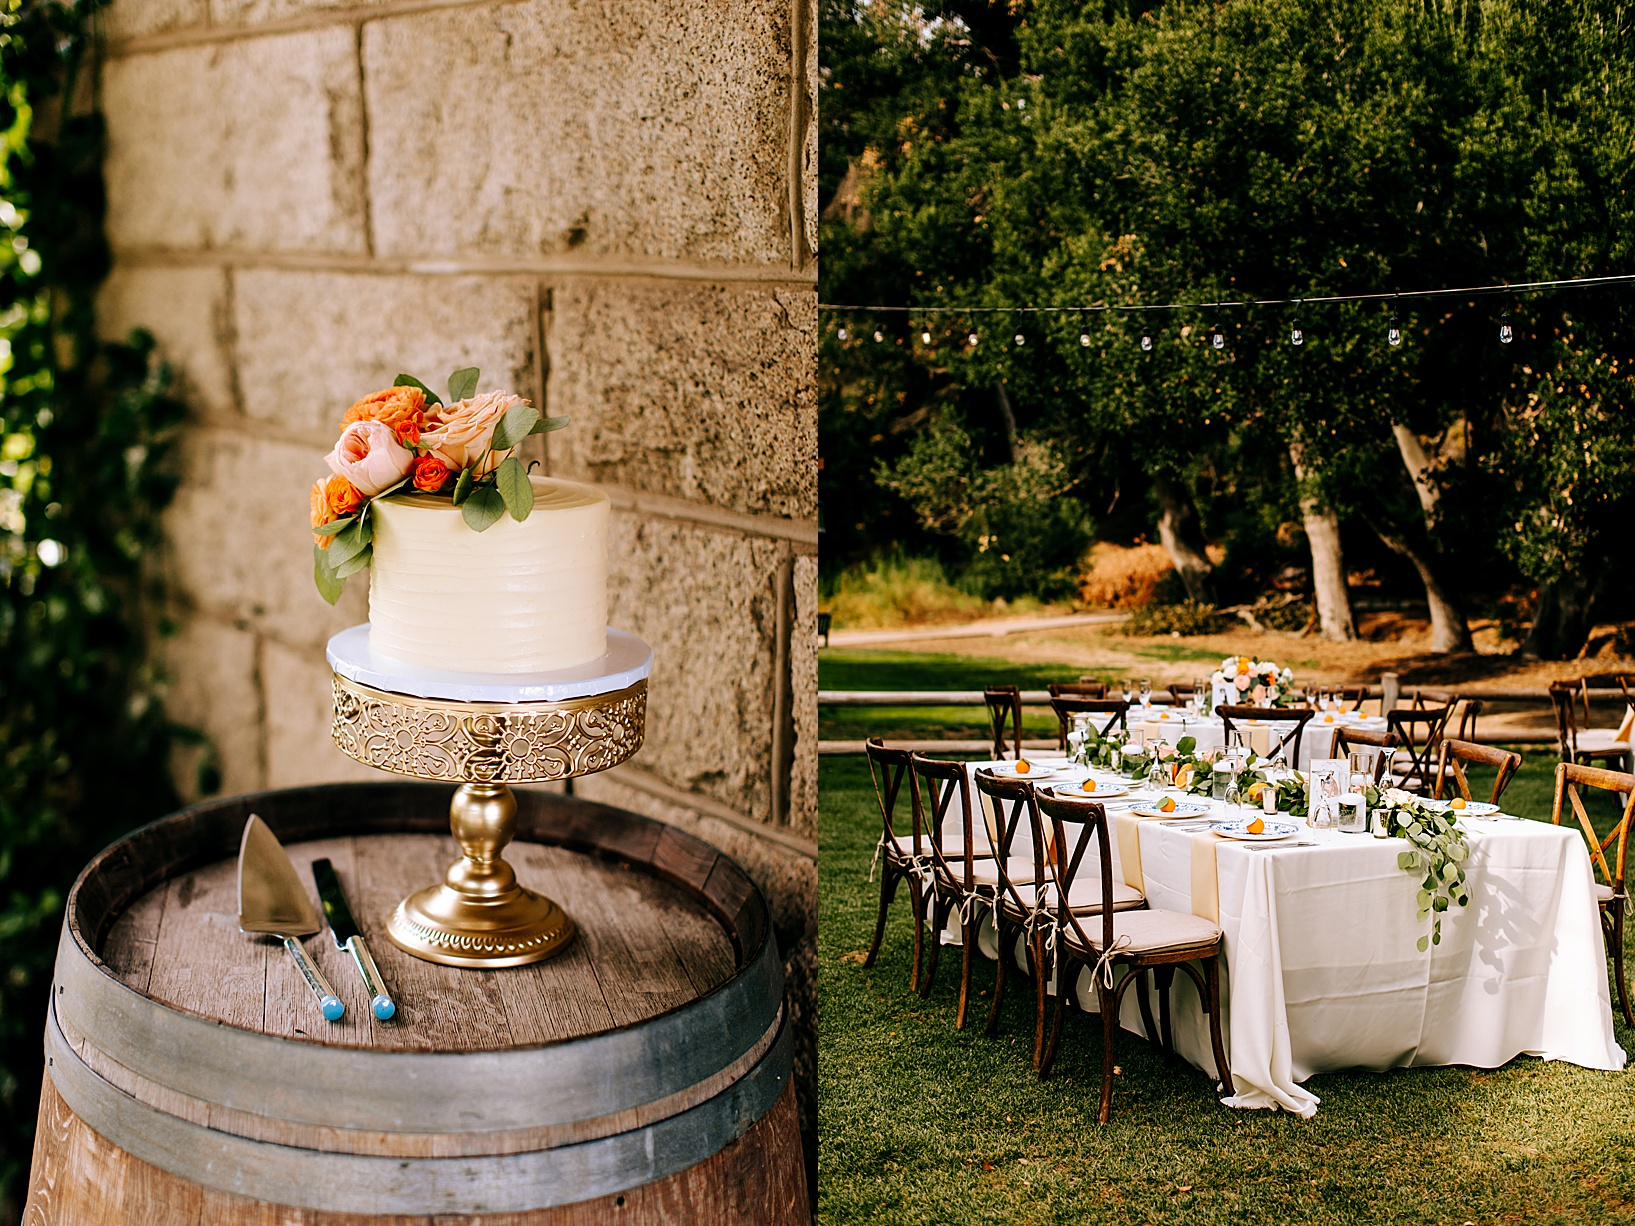 Reception Details for Temecula wedding at Temecula Creek Inn